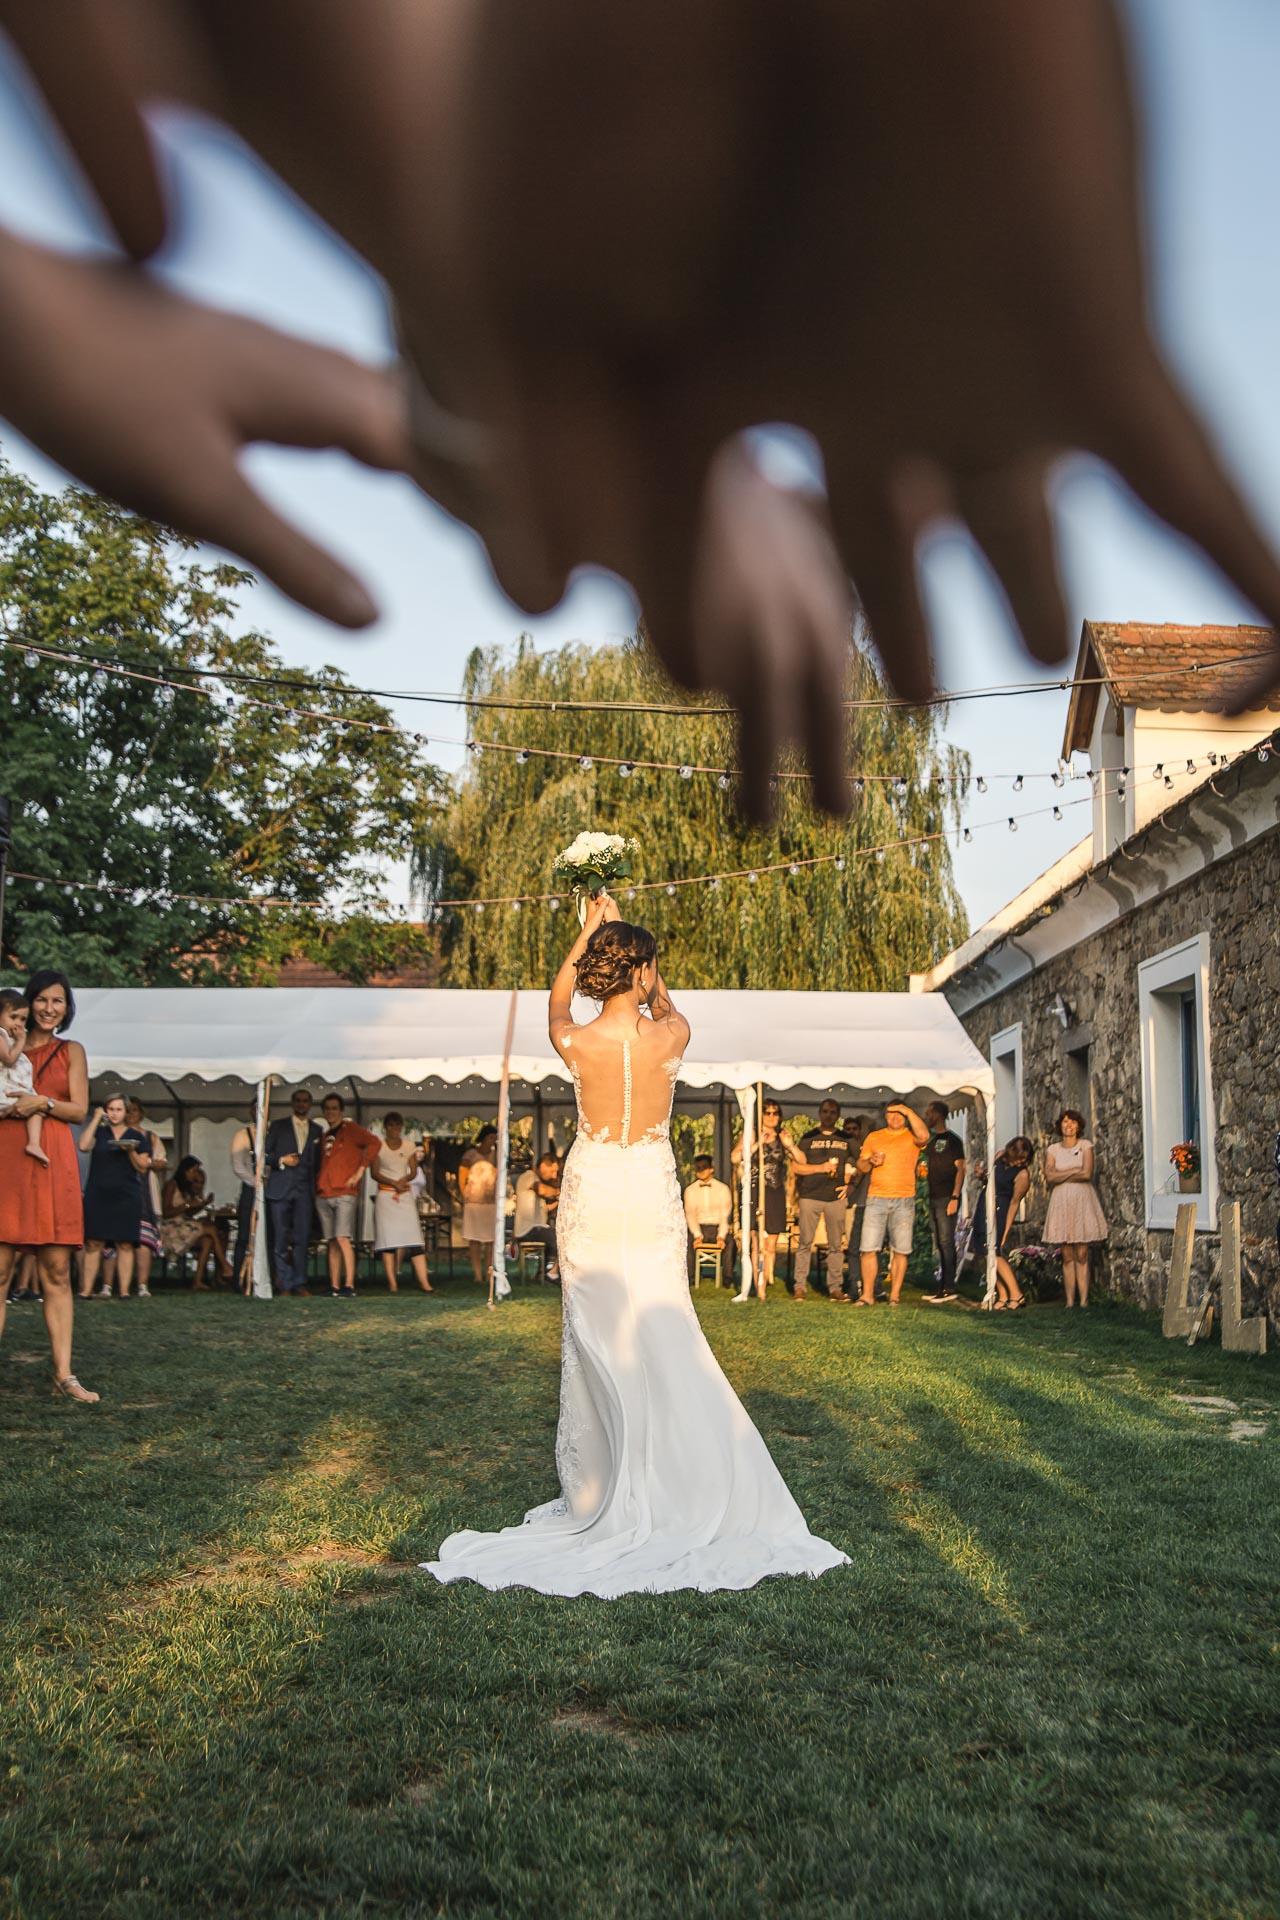 svatební-fotograf-wedding-svatebni-video-orlík-vltava-kostel-statek-stodola-boho-svatba-Beautyfoto-562